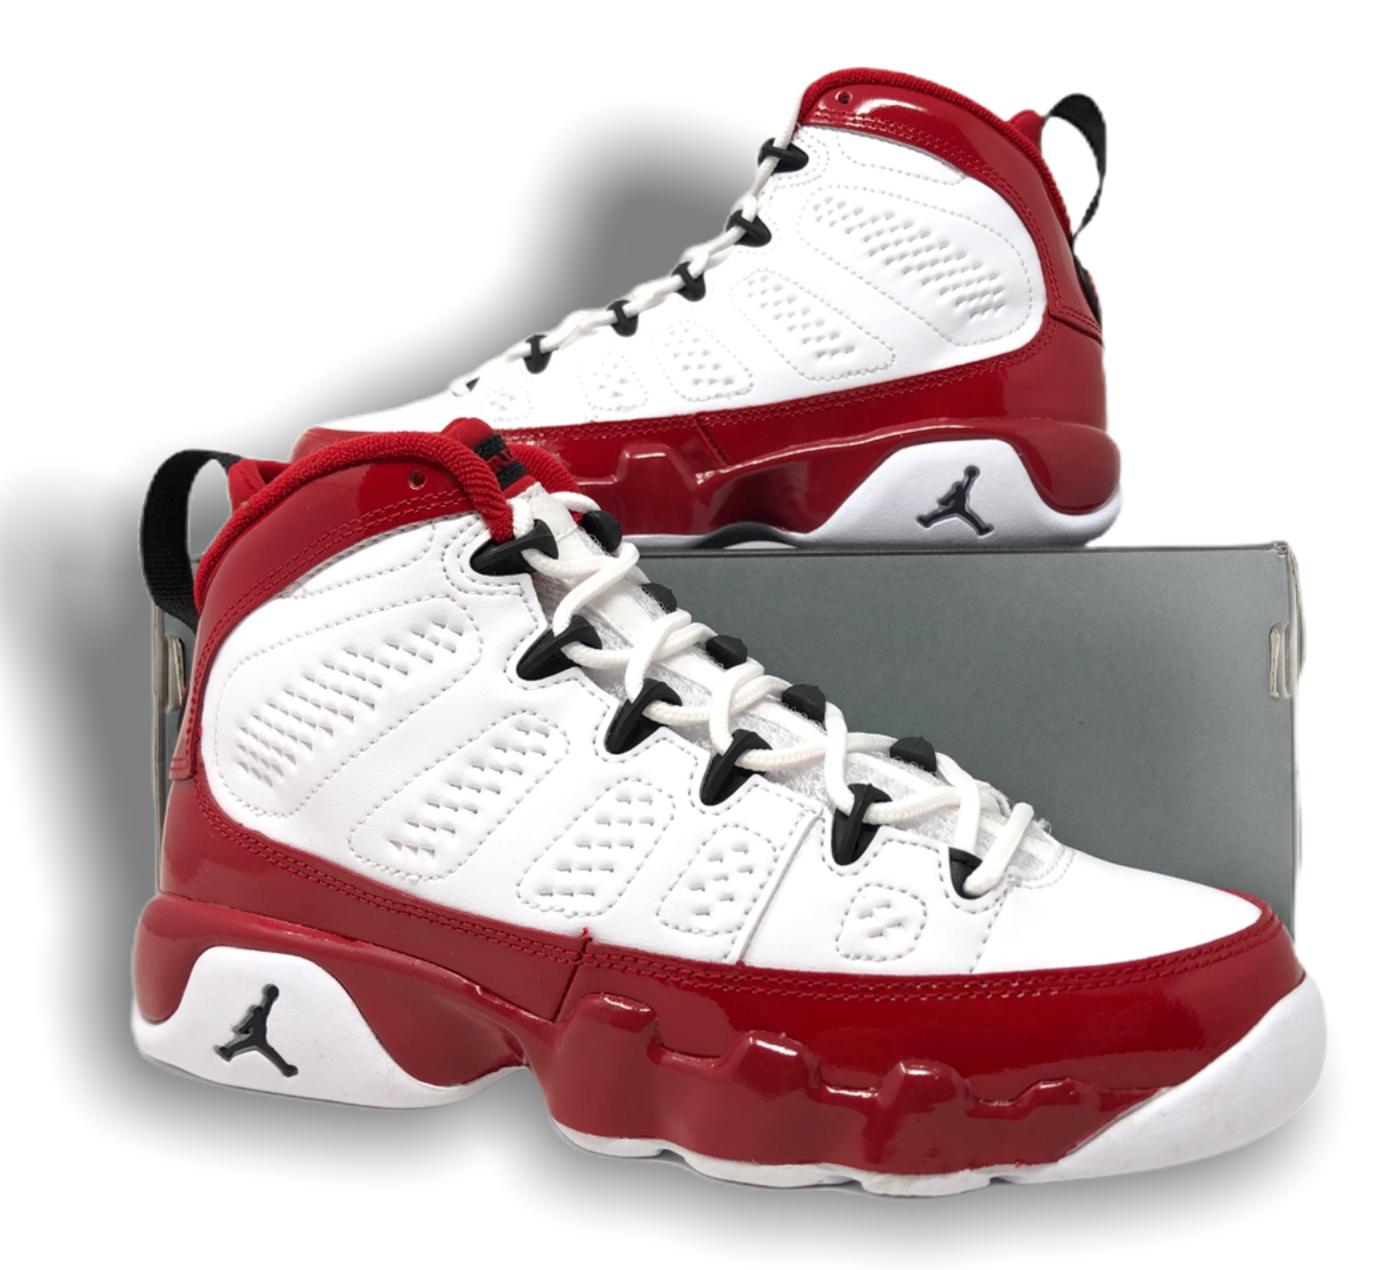 Jordan 9 Retro White Gym Red GS